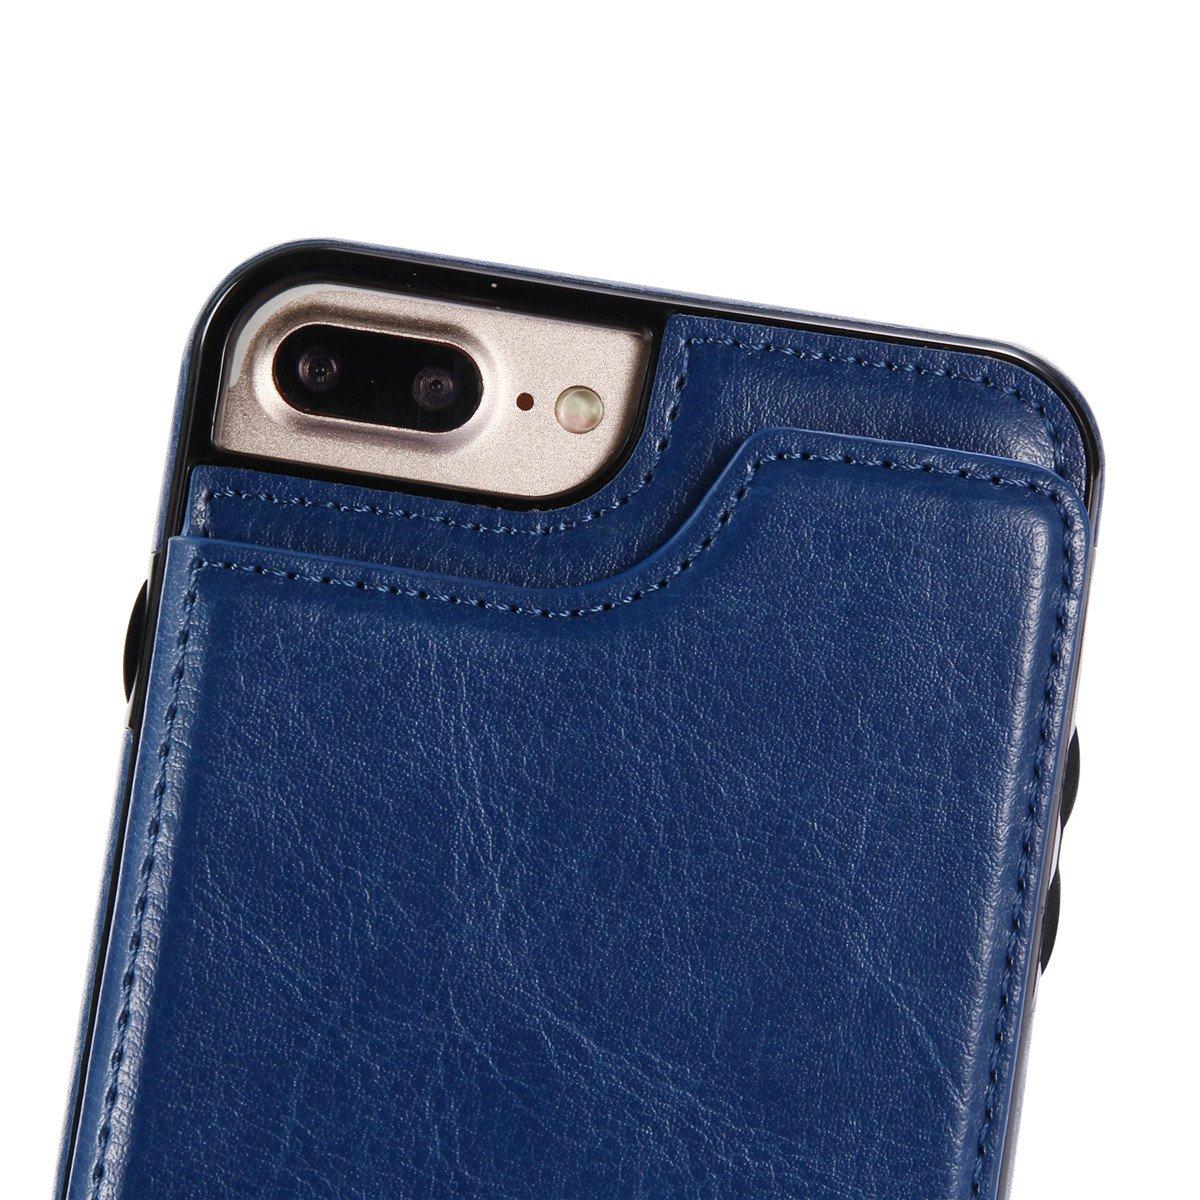 iPhone 7 Plus Rojo adorehouse Flip Stand Case Celular Estuche PU Cuero Cover con tapa tarjetero y soporte Dise/ño Billetera Carcasa para iPhone 7 Plus iPhone 8 Plus iPhone 8 Plus Funda